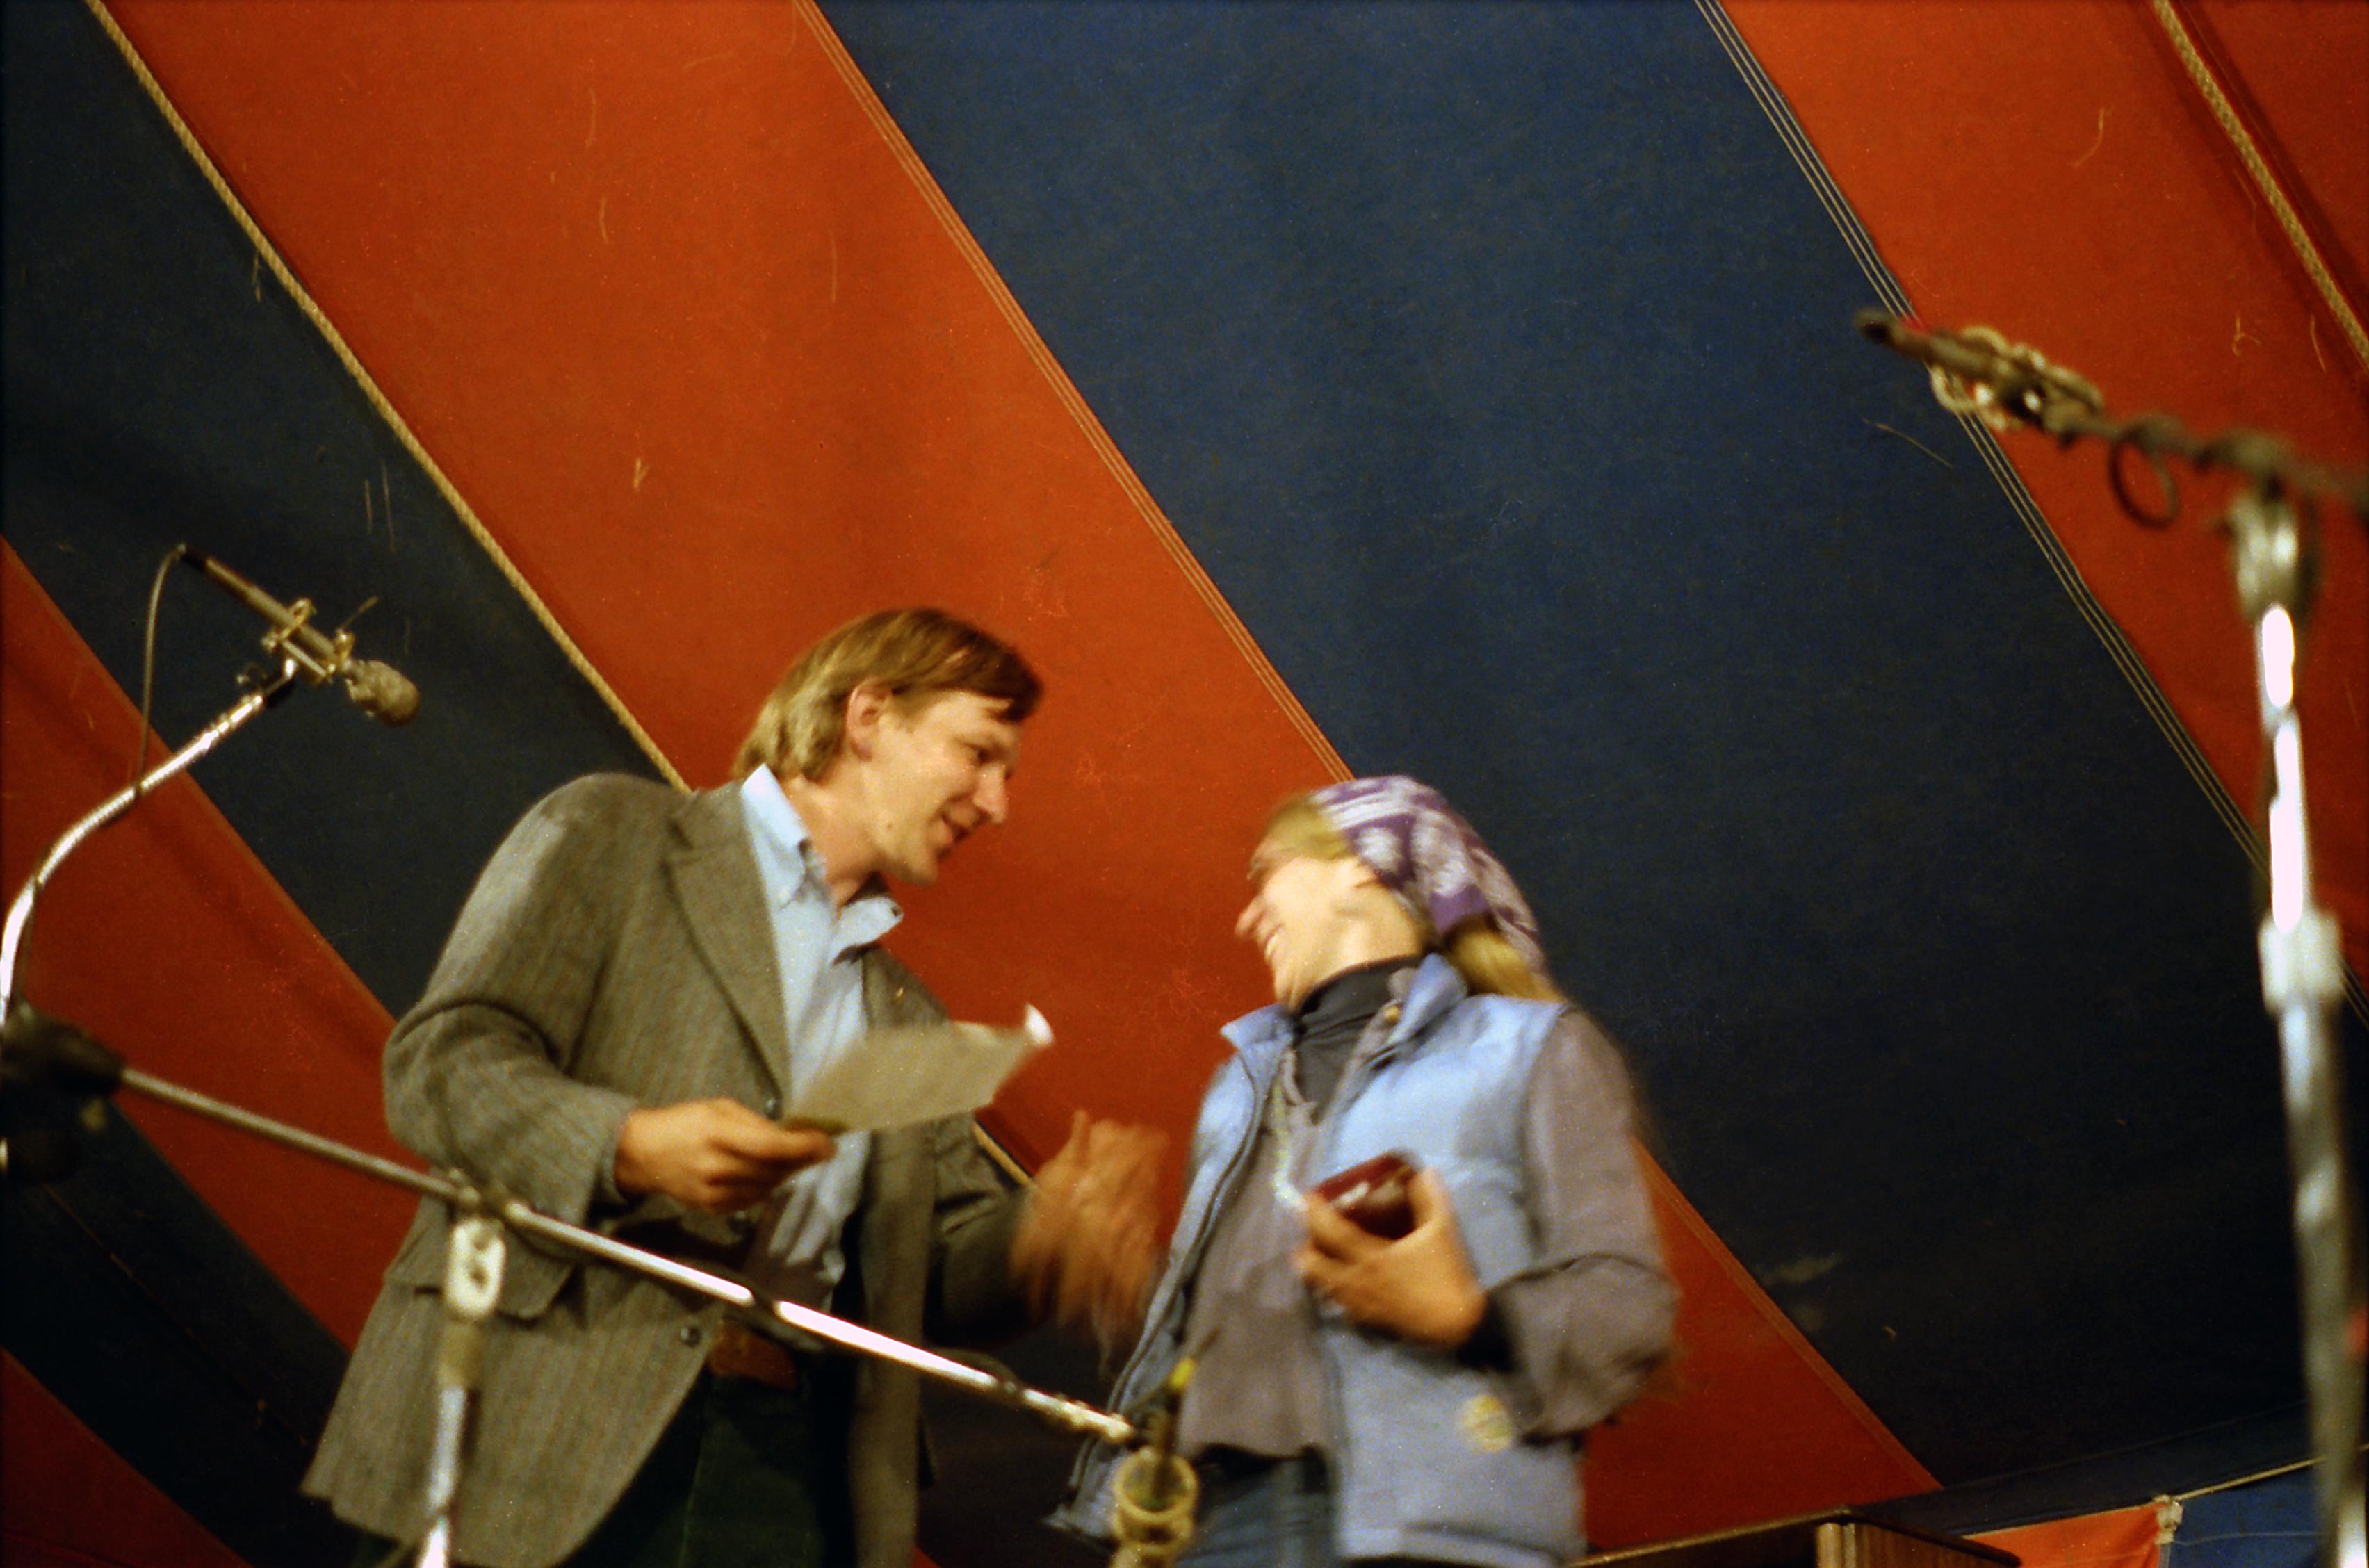 Frank and Irene Herrman